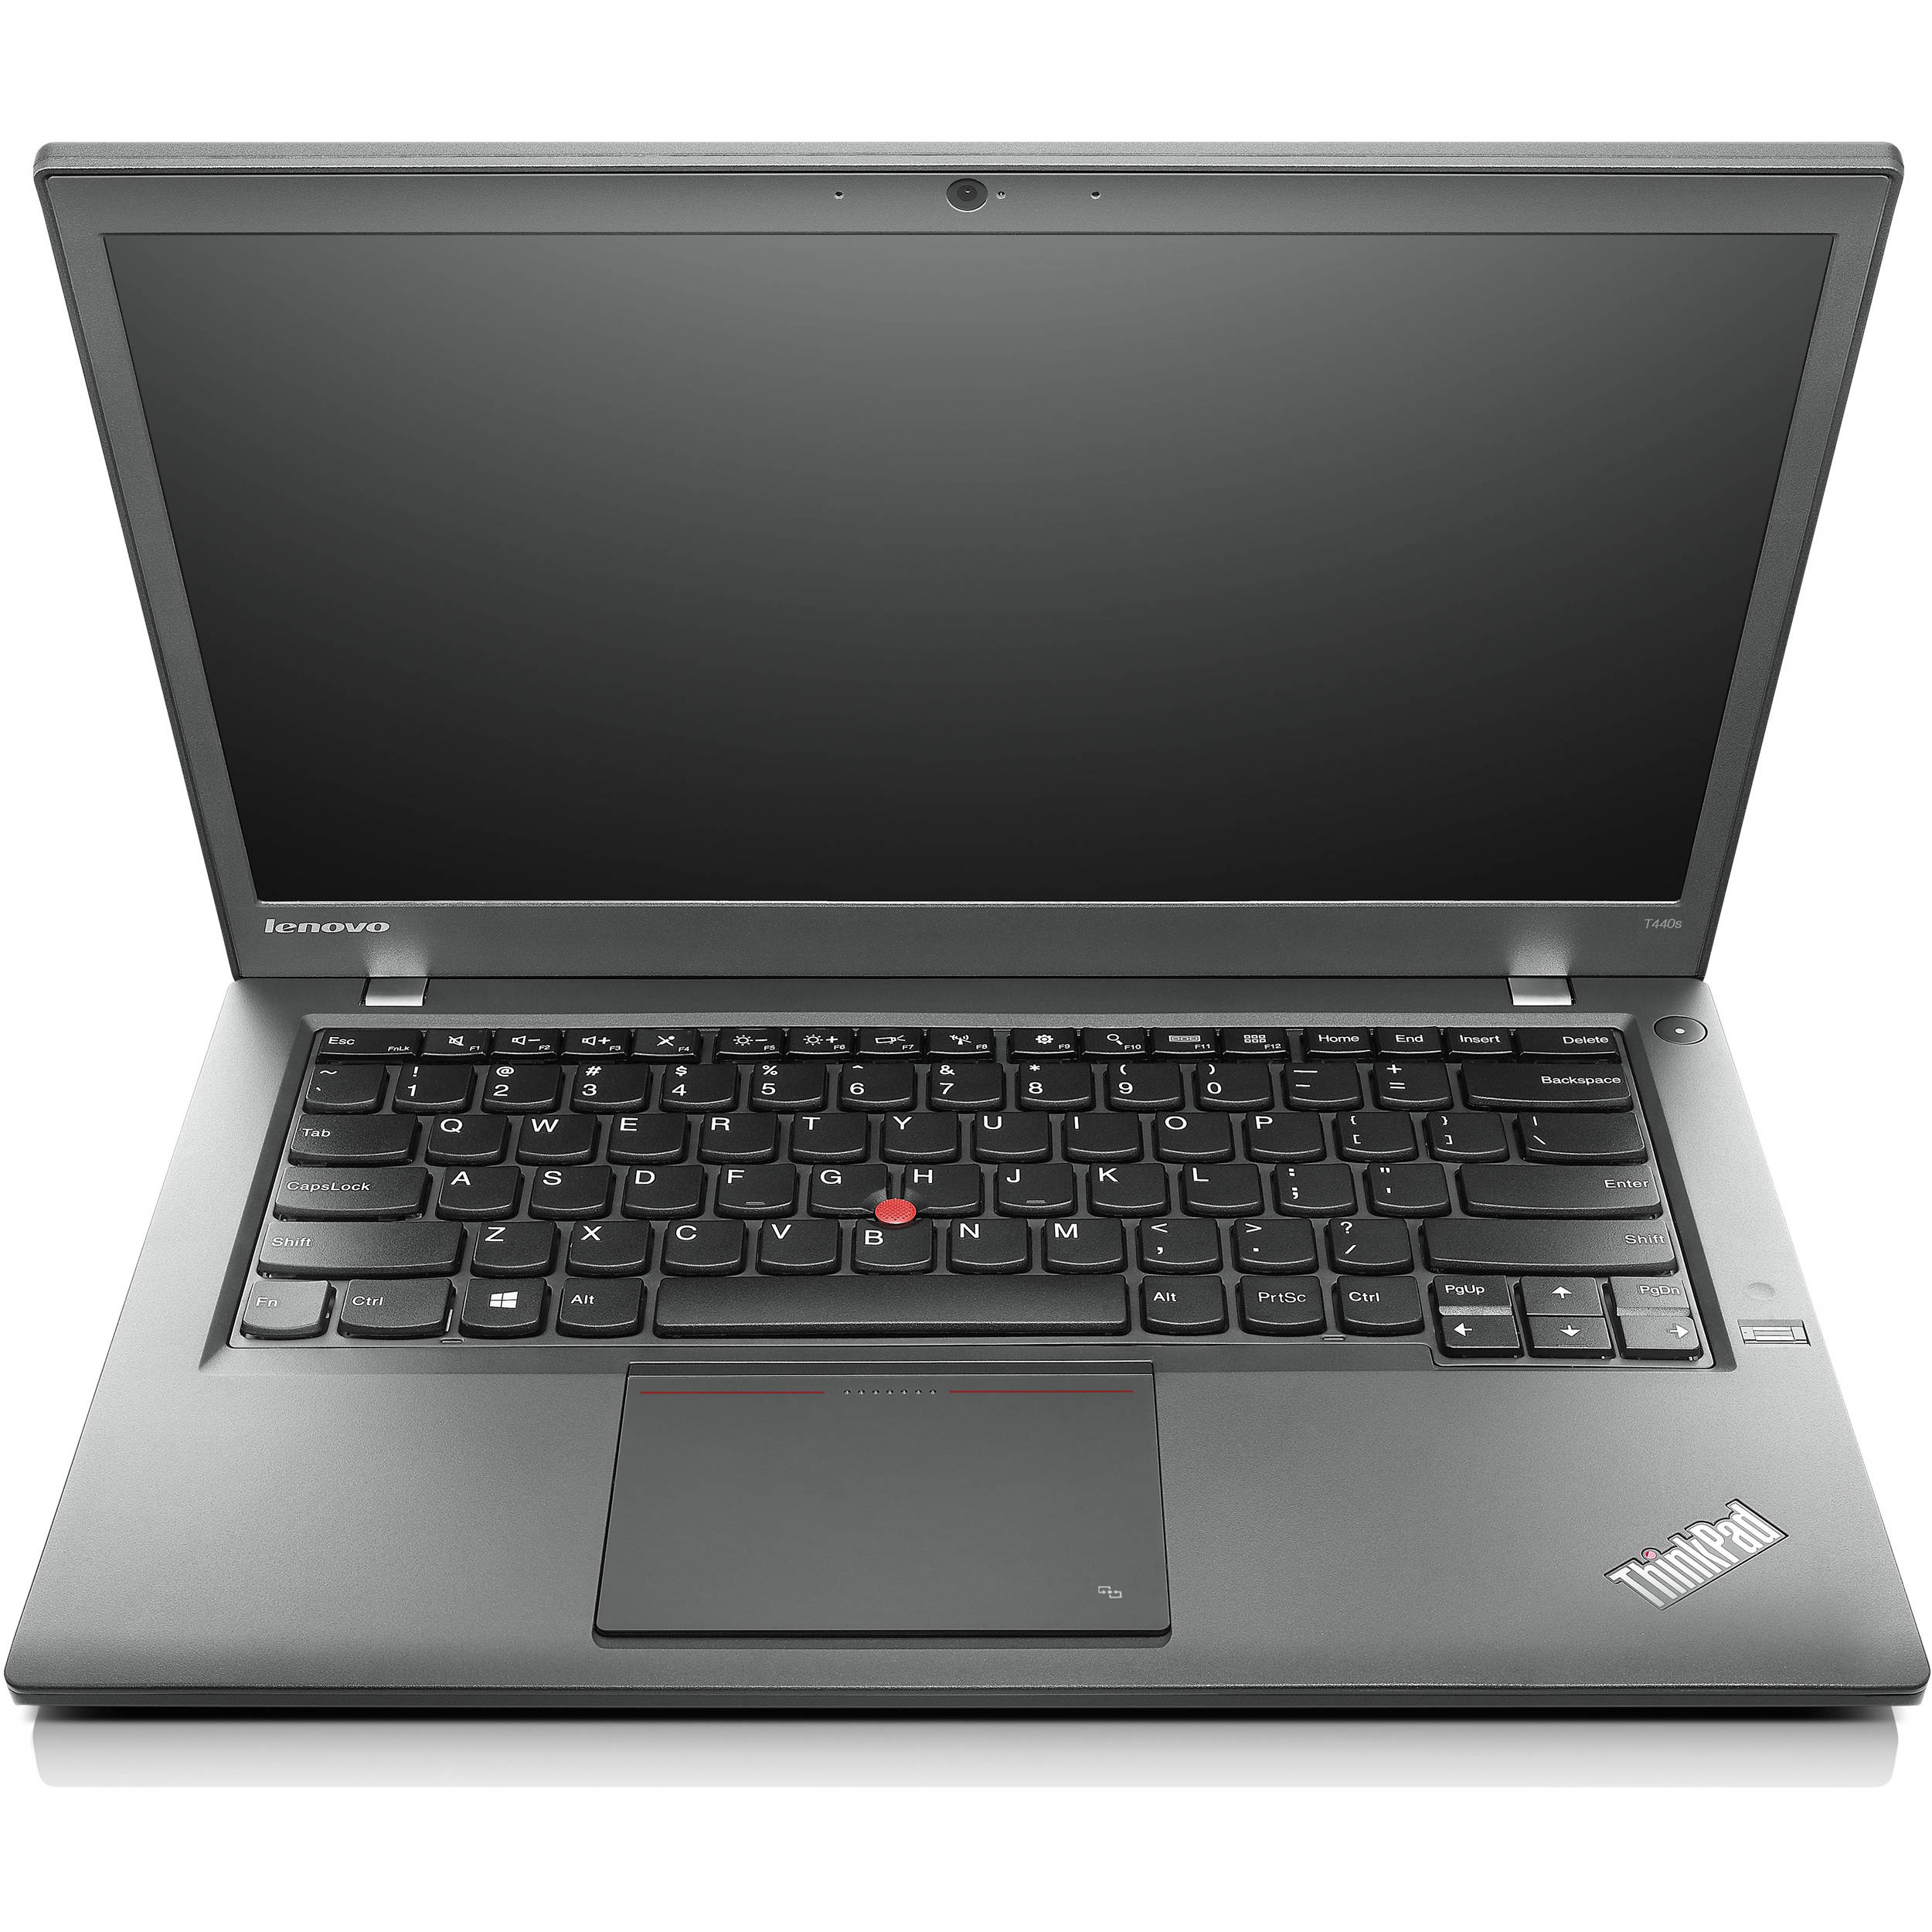 Lenovo ThinkPad T440s 20AQ005NUS 14